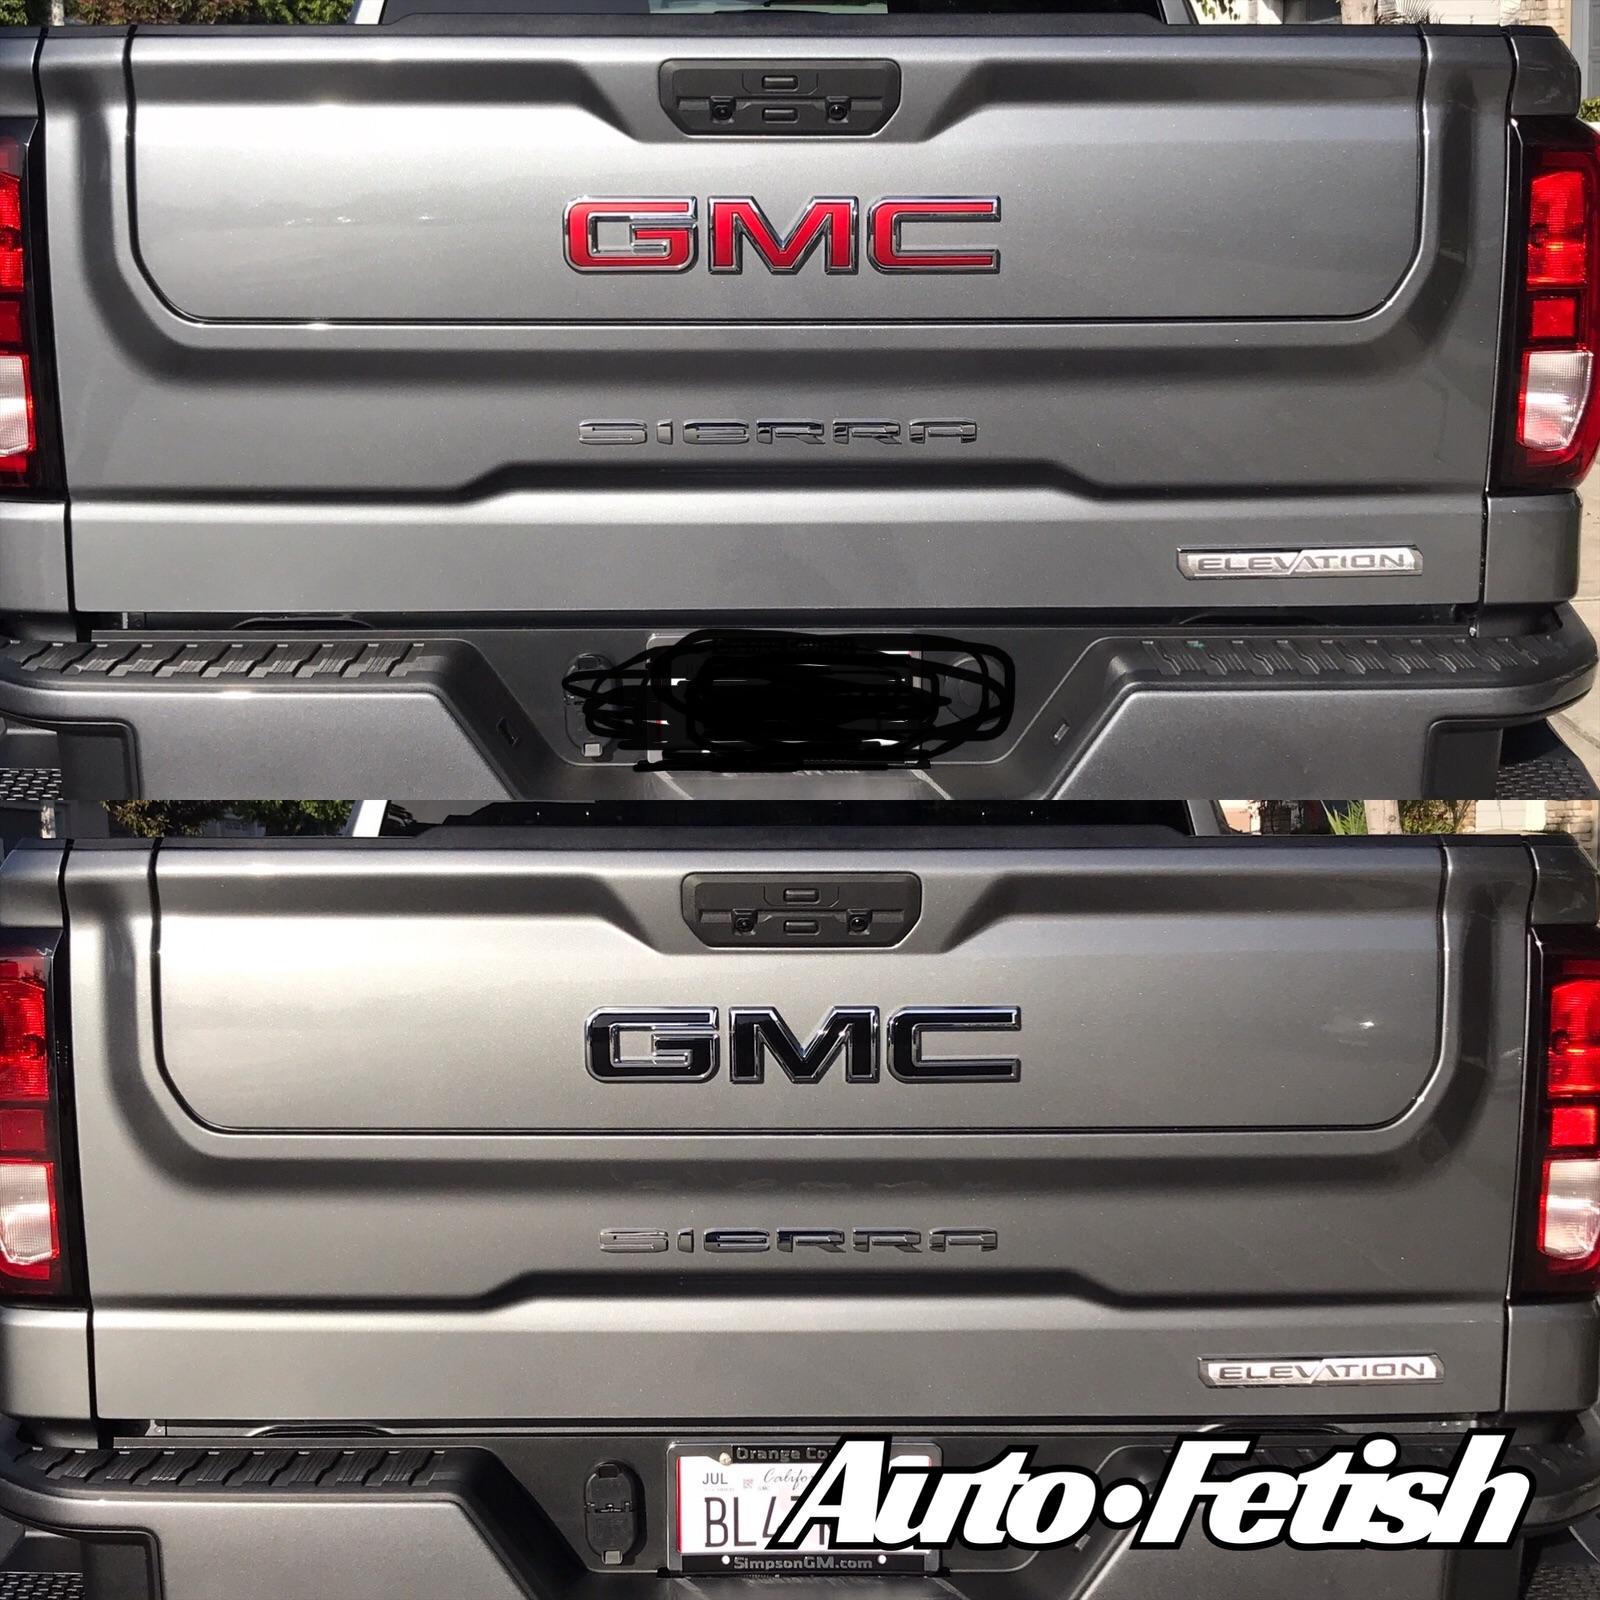 2021 GMC badge swap